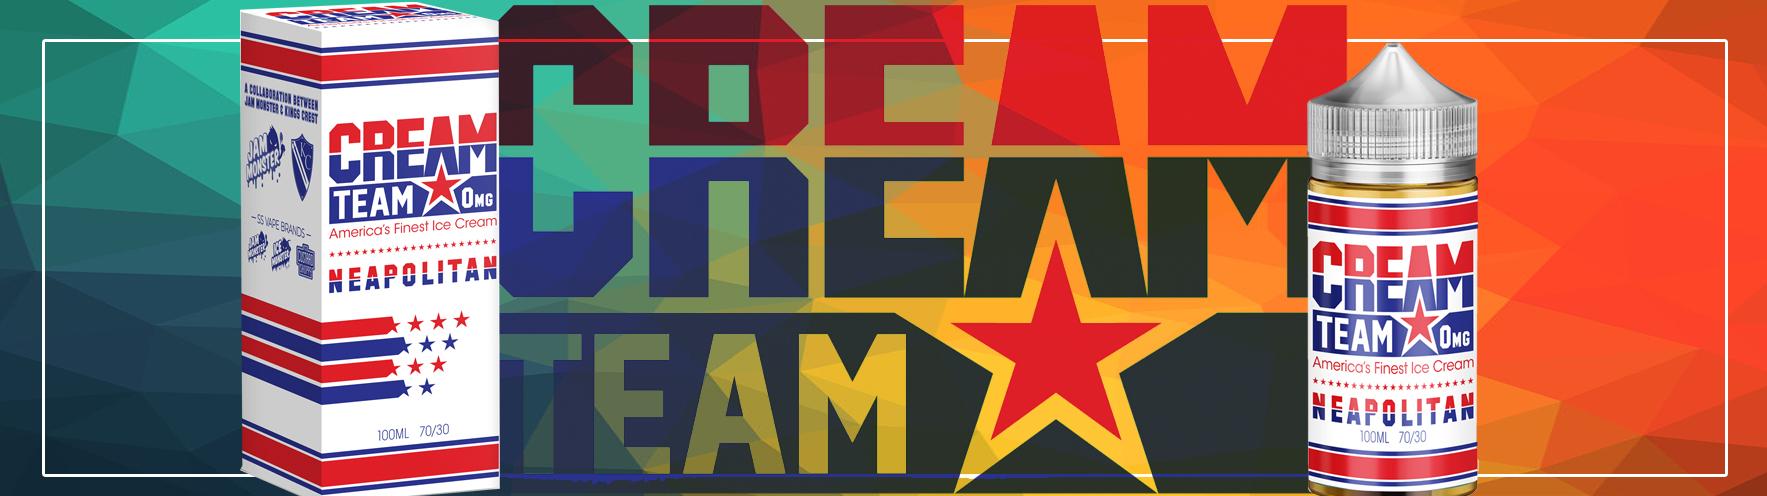 cream team ilfumo - Жидкость Cream Team